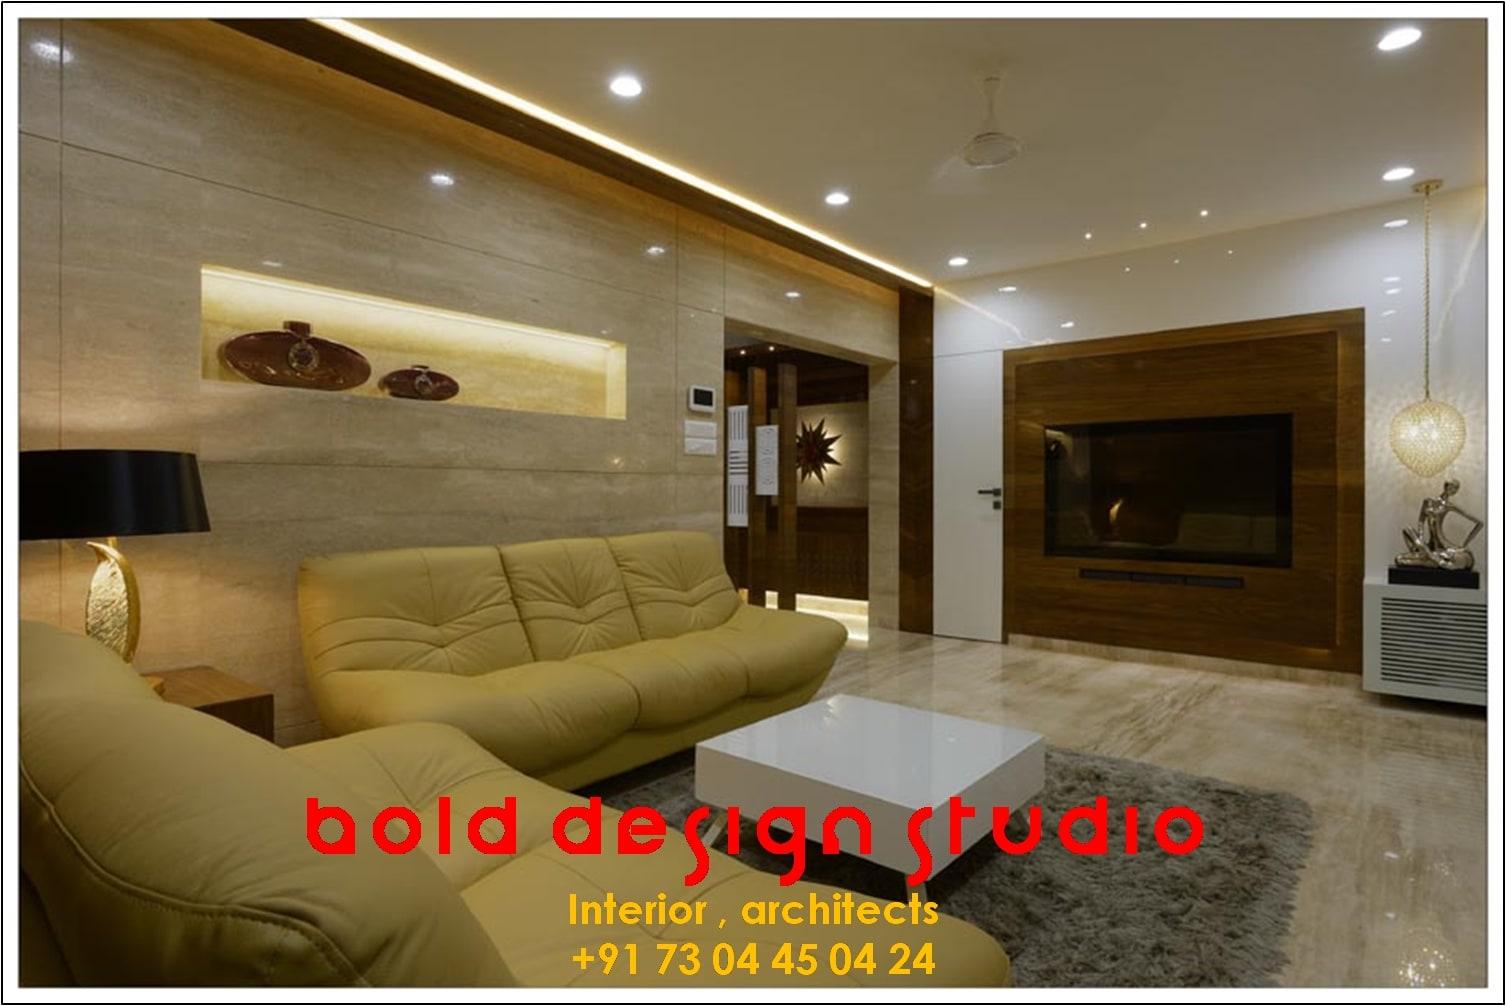 Bold Design Studio Photos Lohegaon Pune Pictures Images Gallery